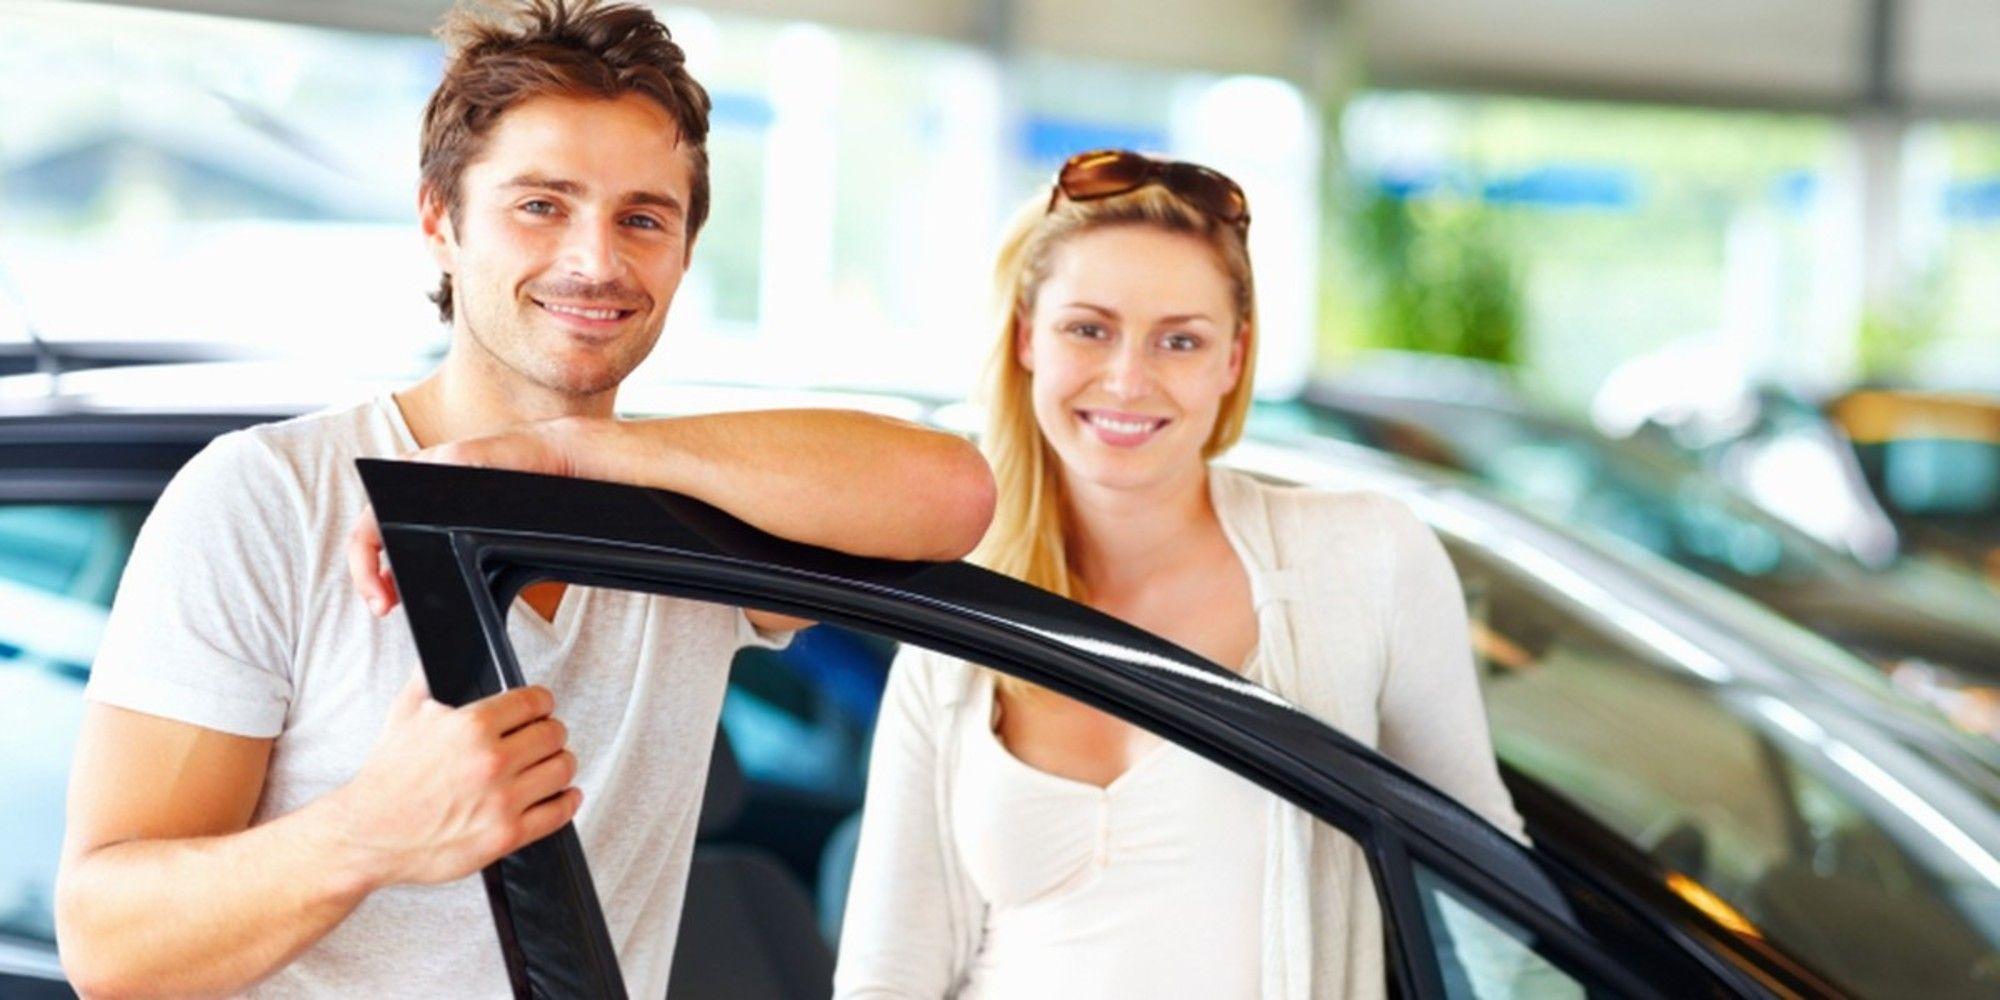 Colorado auto insurance laws no fault policies affordable